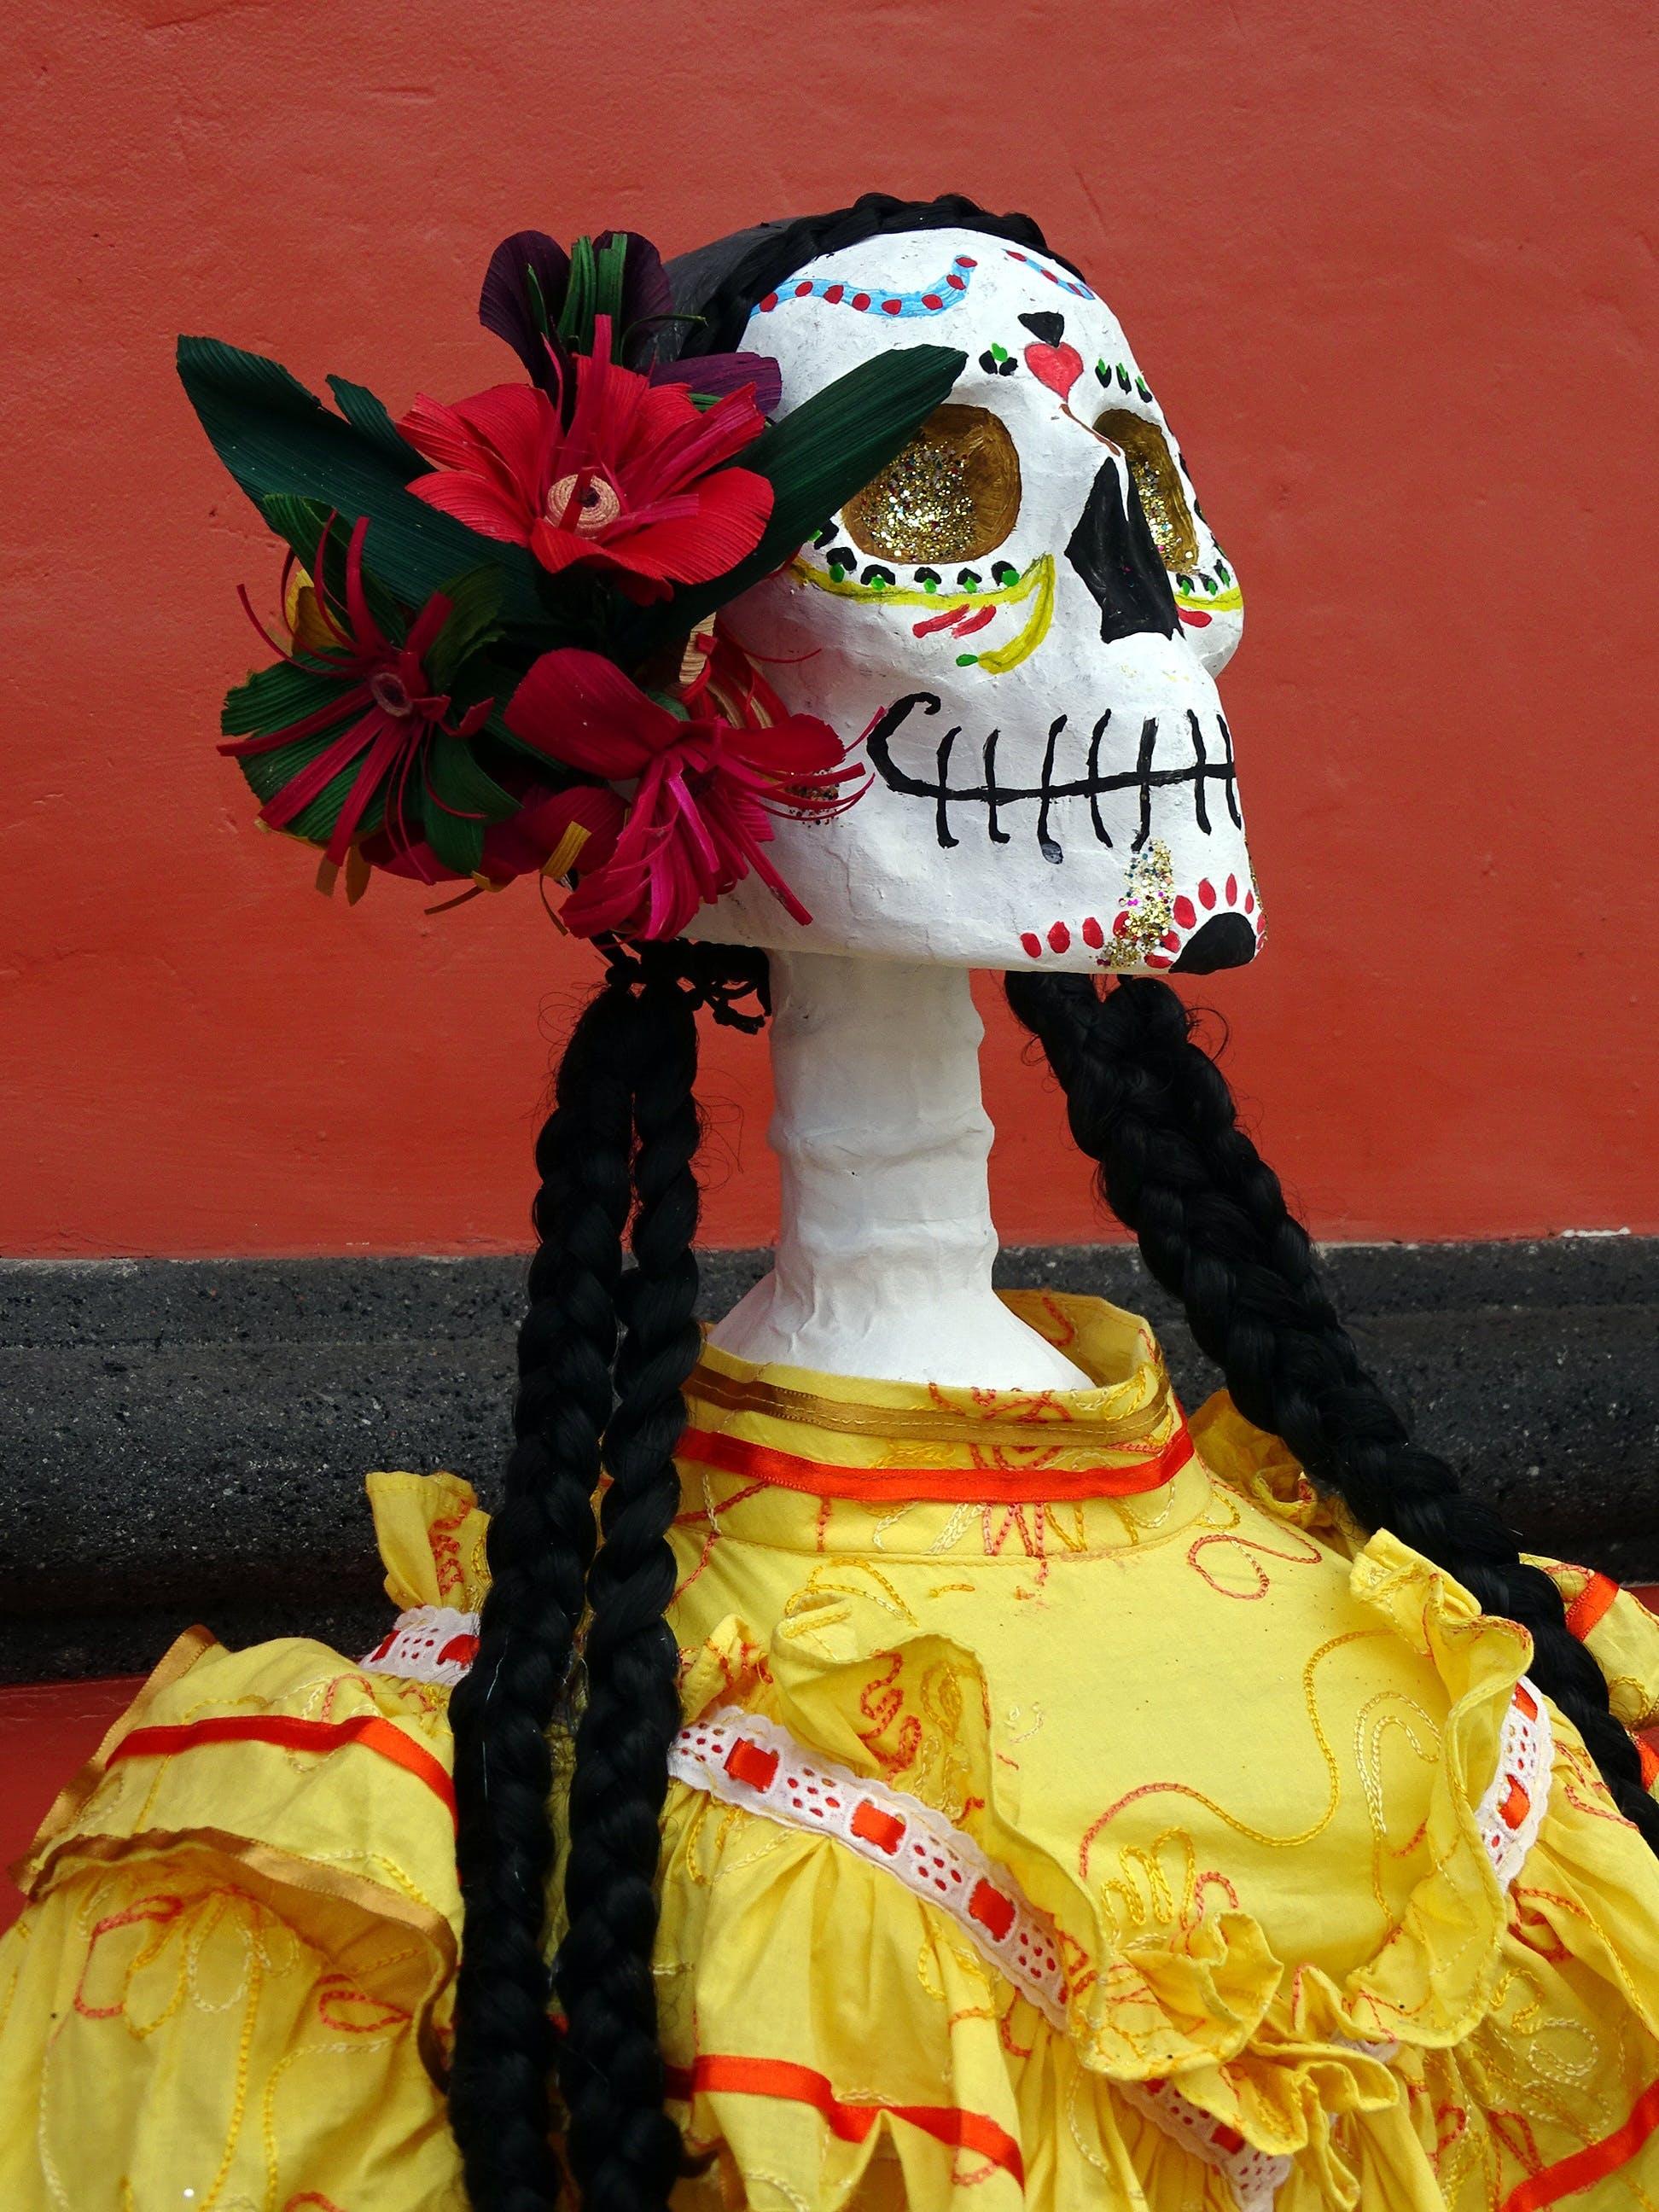 La Katrina Figurine With Yellow Dress